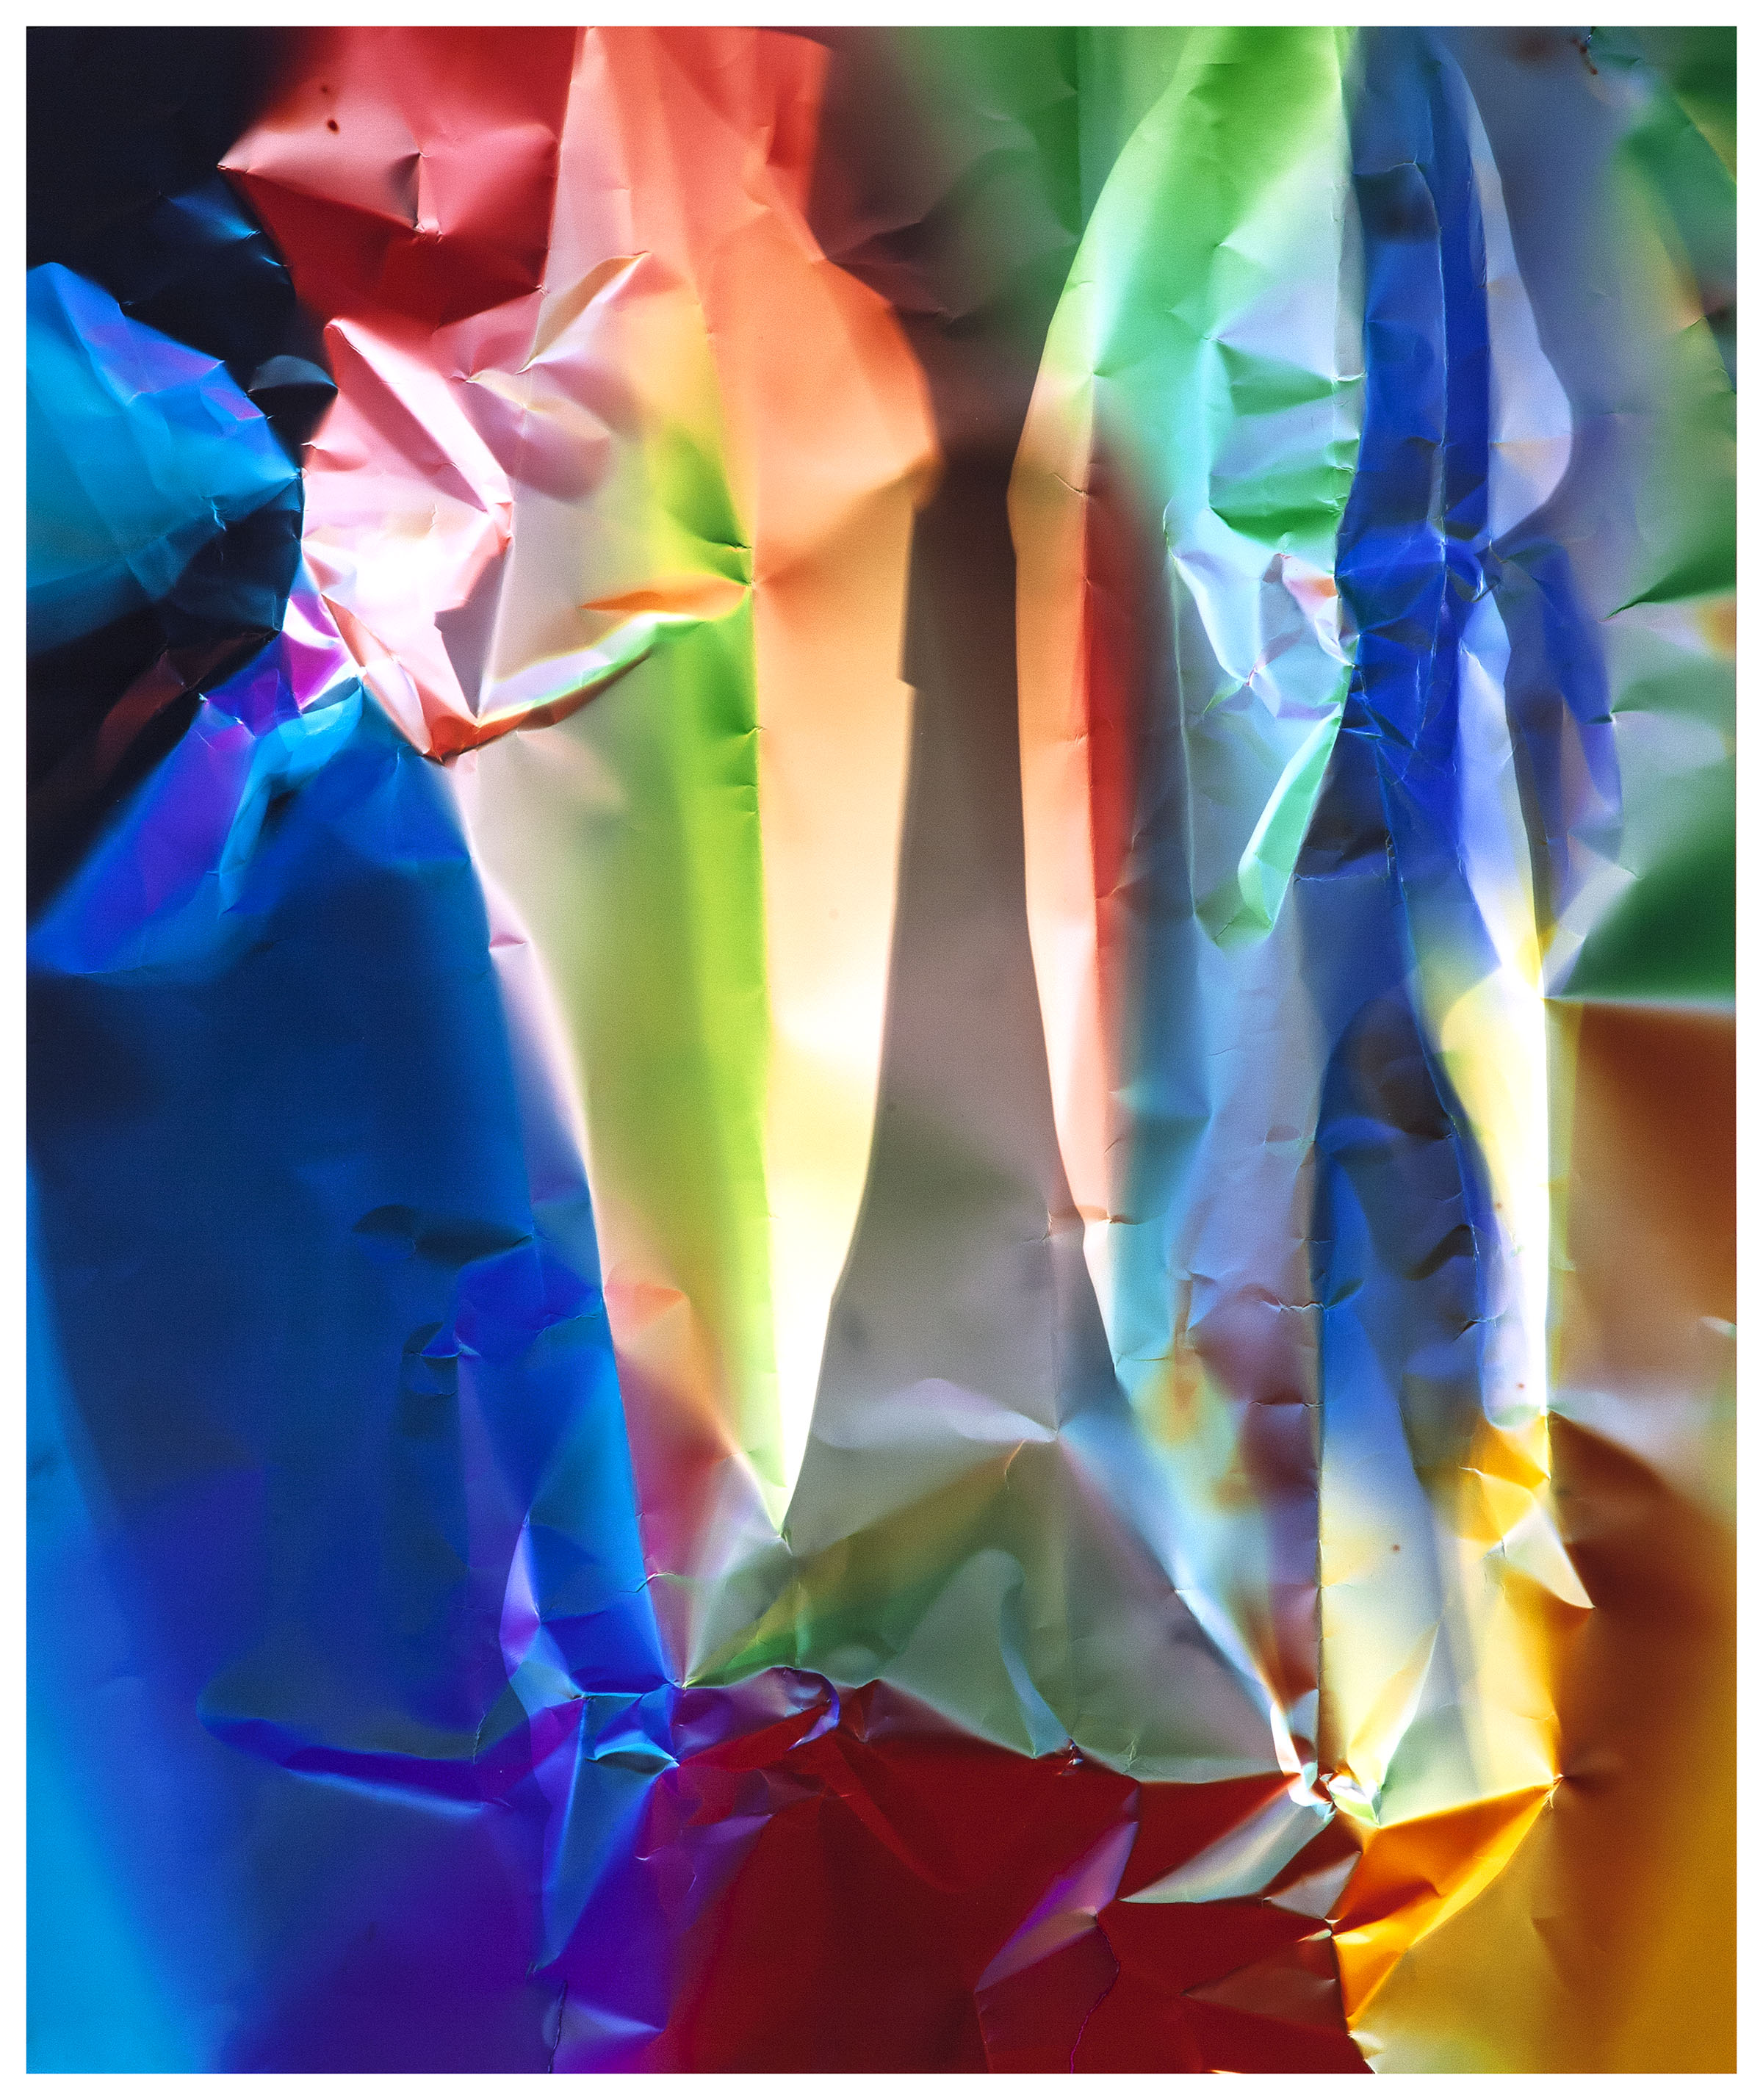 Hartford Art School Galleries_Ellen Carey_Dings&Shadows1_2019 Color Photograms_24%22x20%22_$7000.jpeg